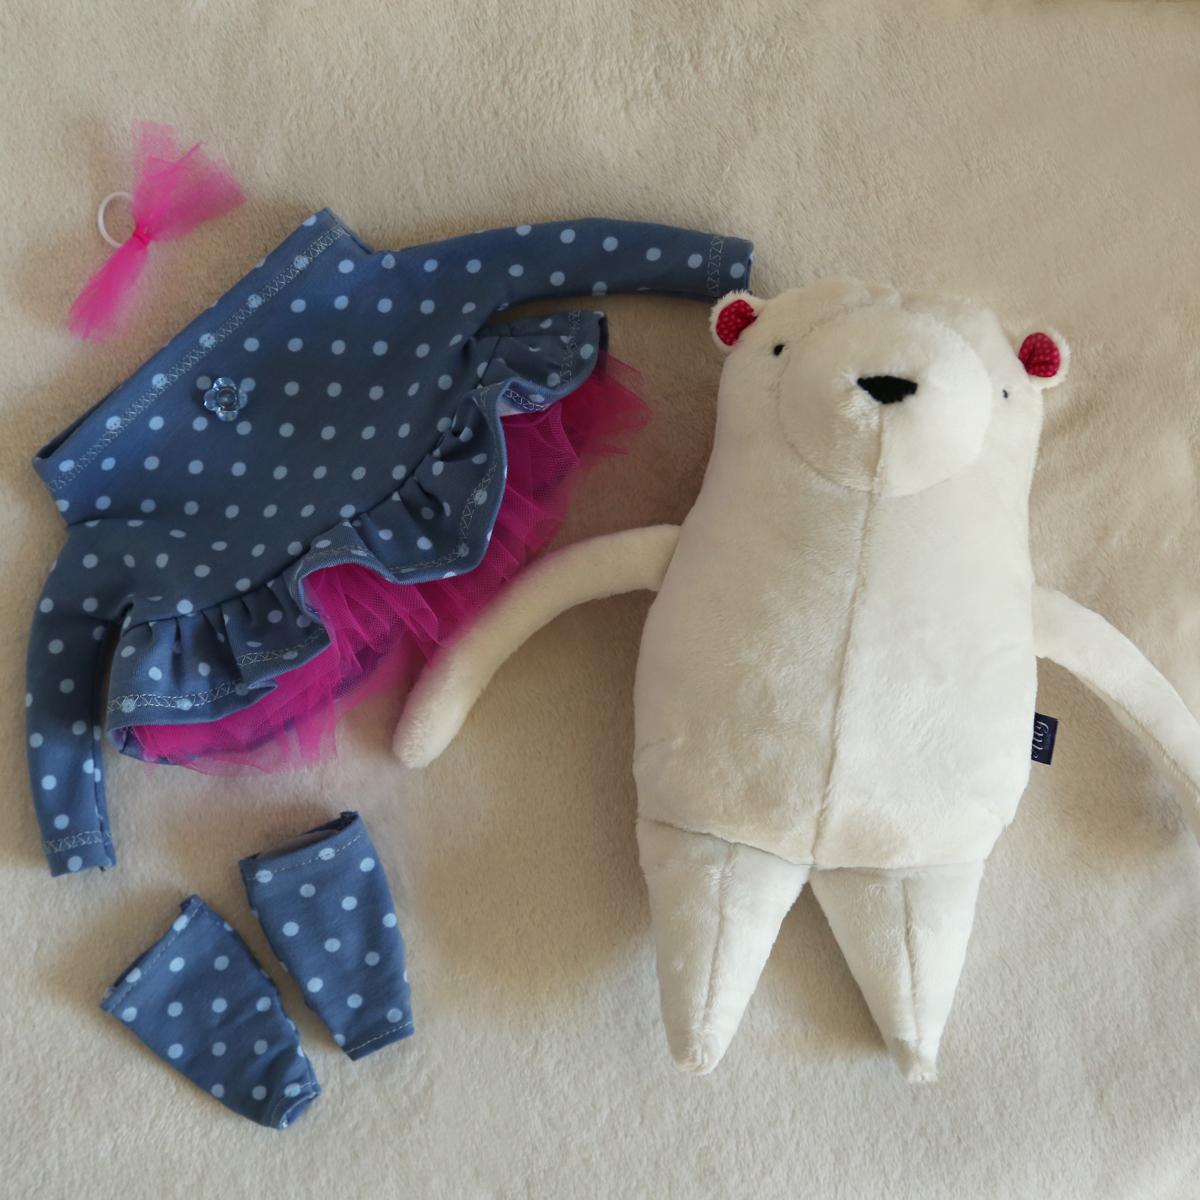 Allydsign originální hračka medvídek baletka